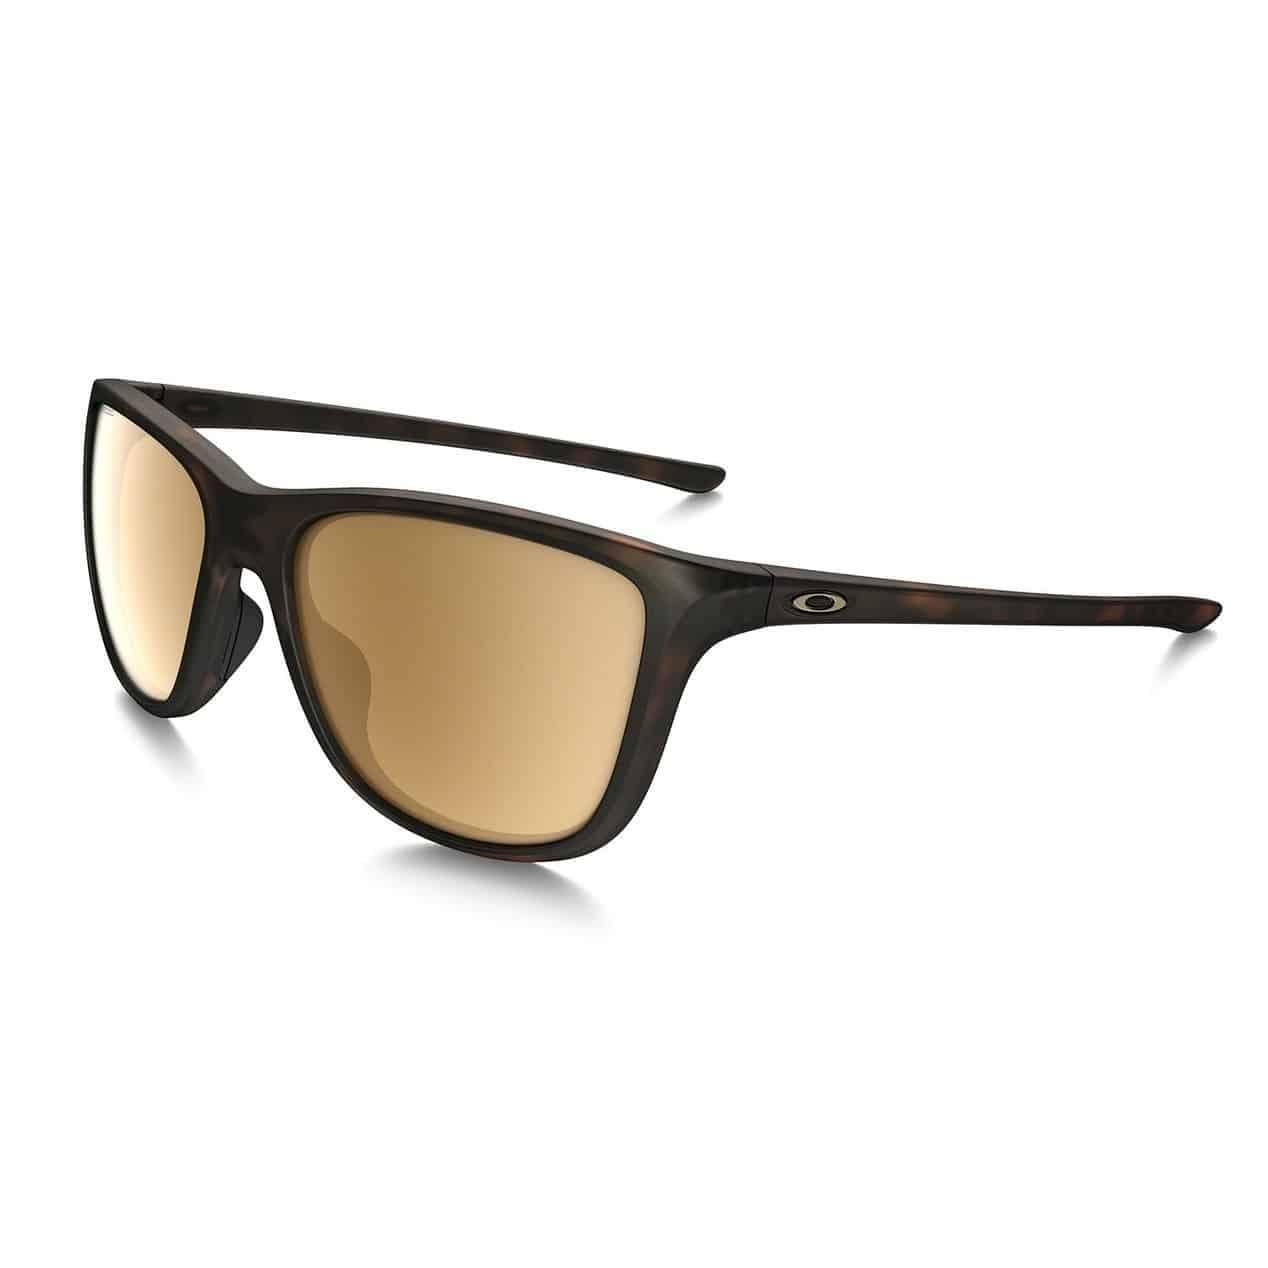 Reverie Sunglasses by Oakley